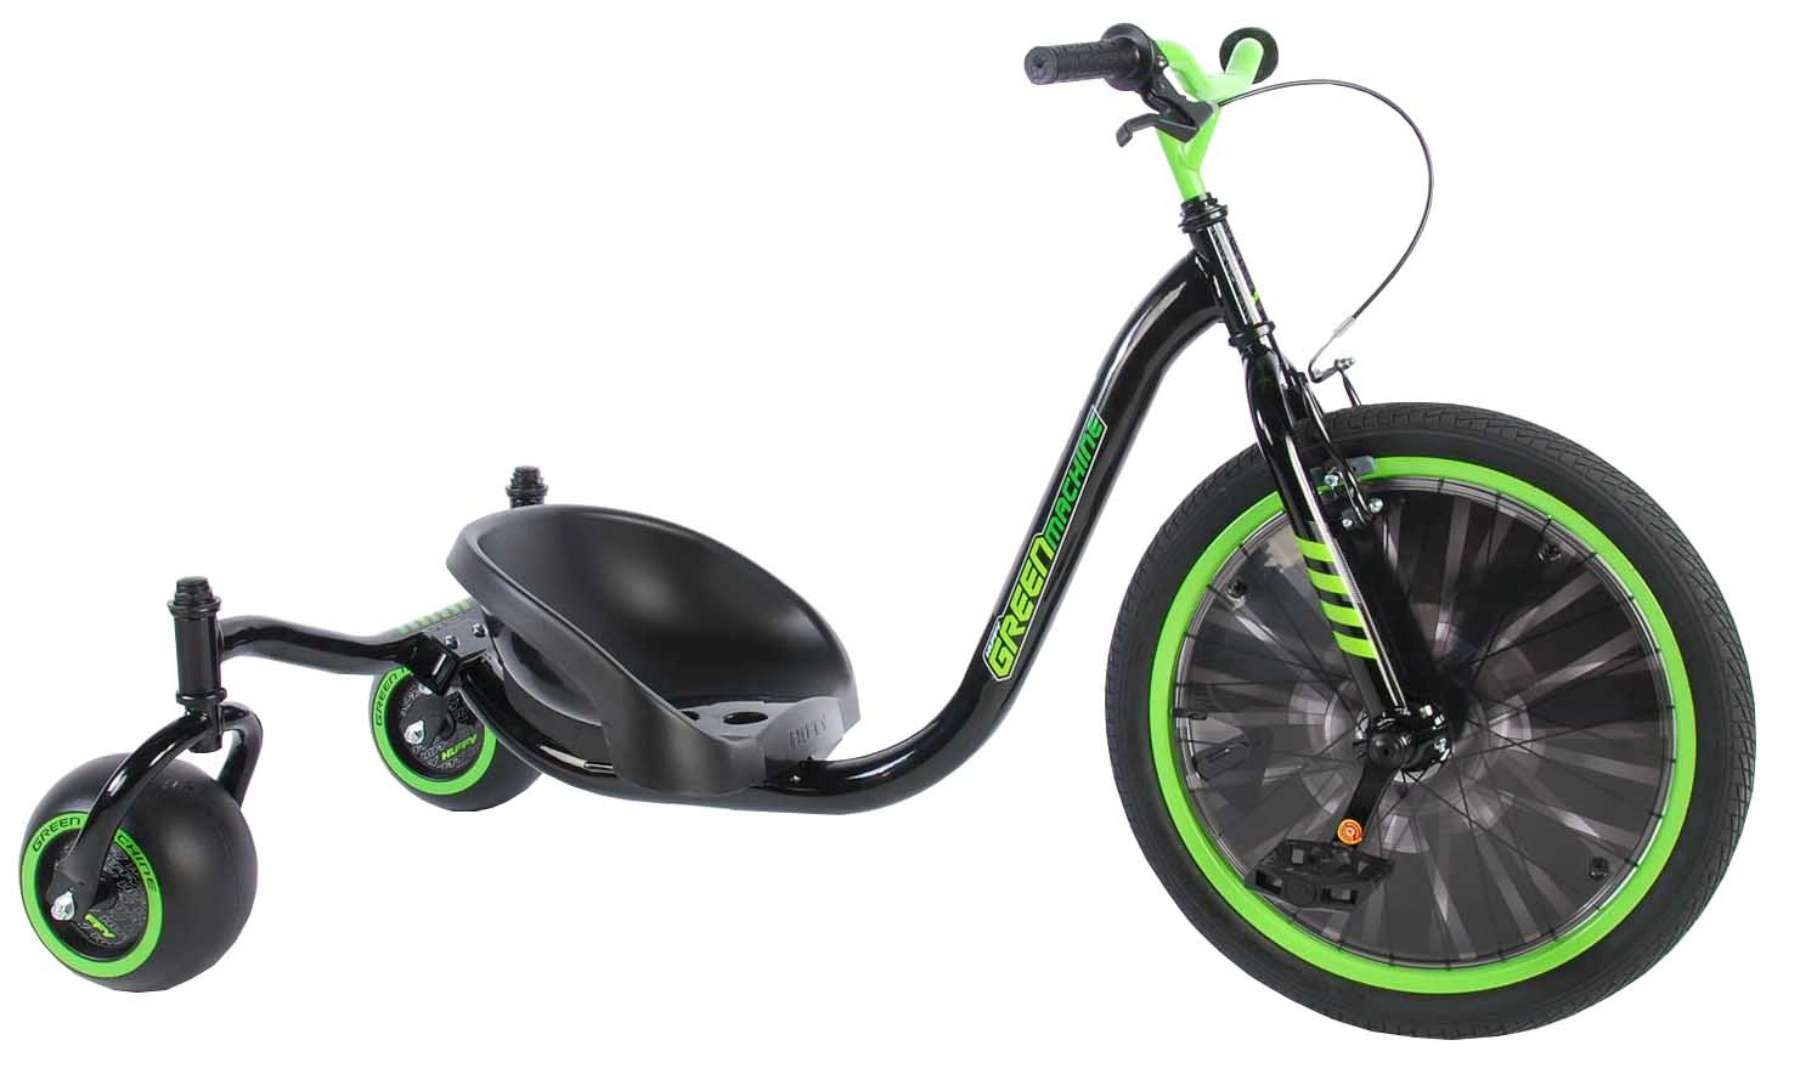 Huffy Green Machine Drift Trike 20 Inch Junior Greenblack Twm Tom